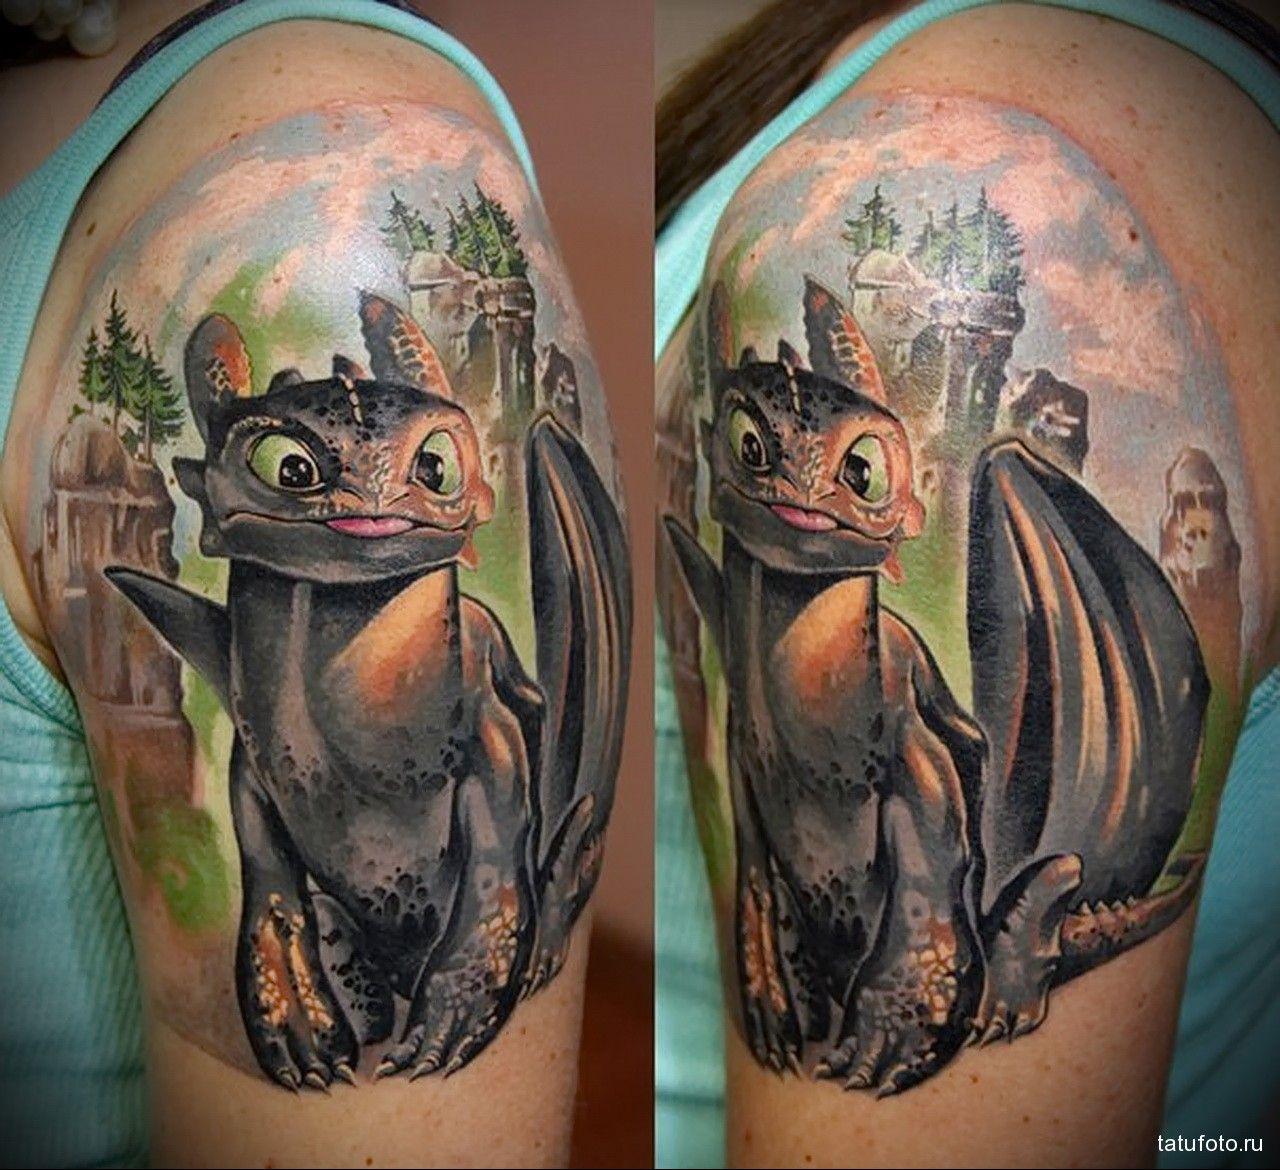 тату-дракон-из-мультика-беззубик-мужская-татуировка-на-плече.jpg (1280×1170)